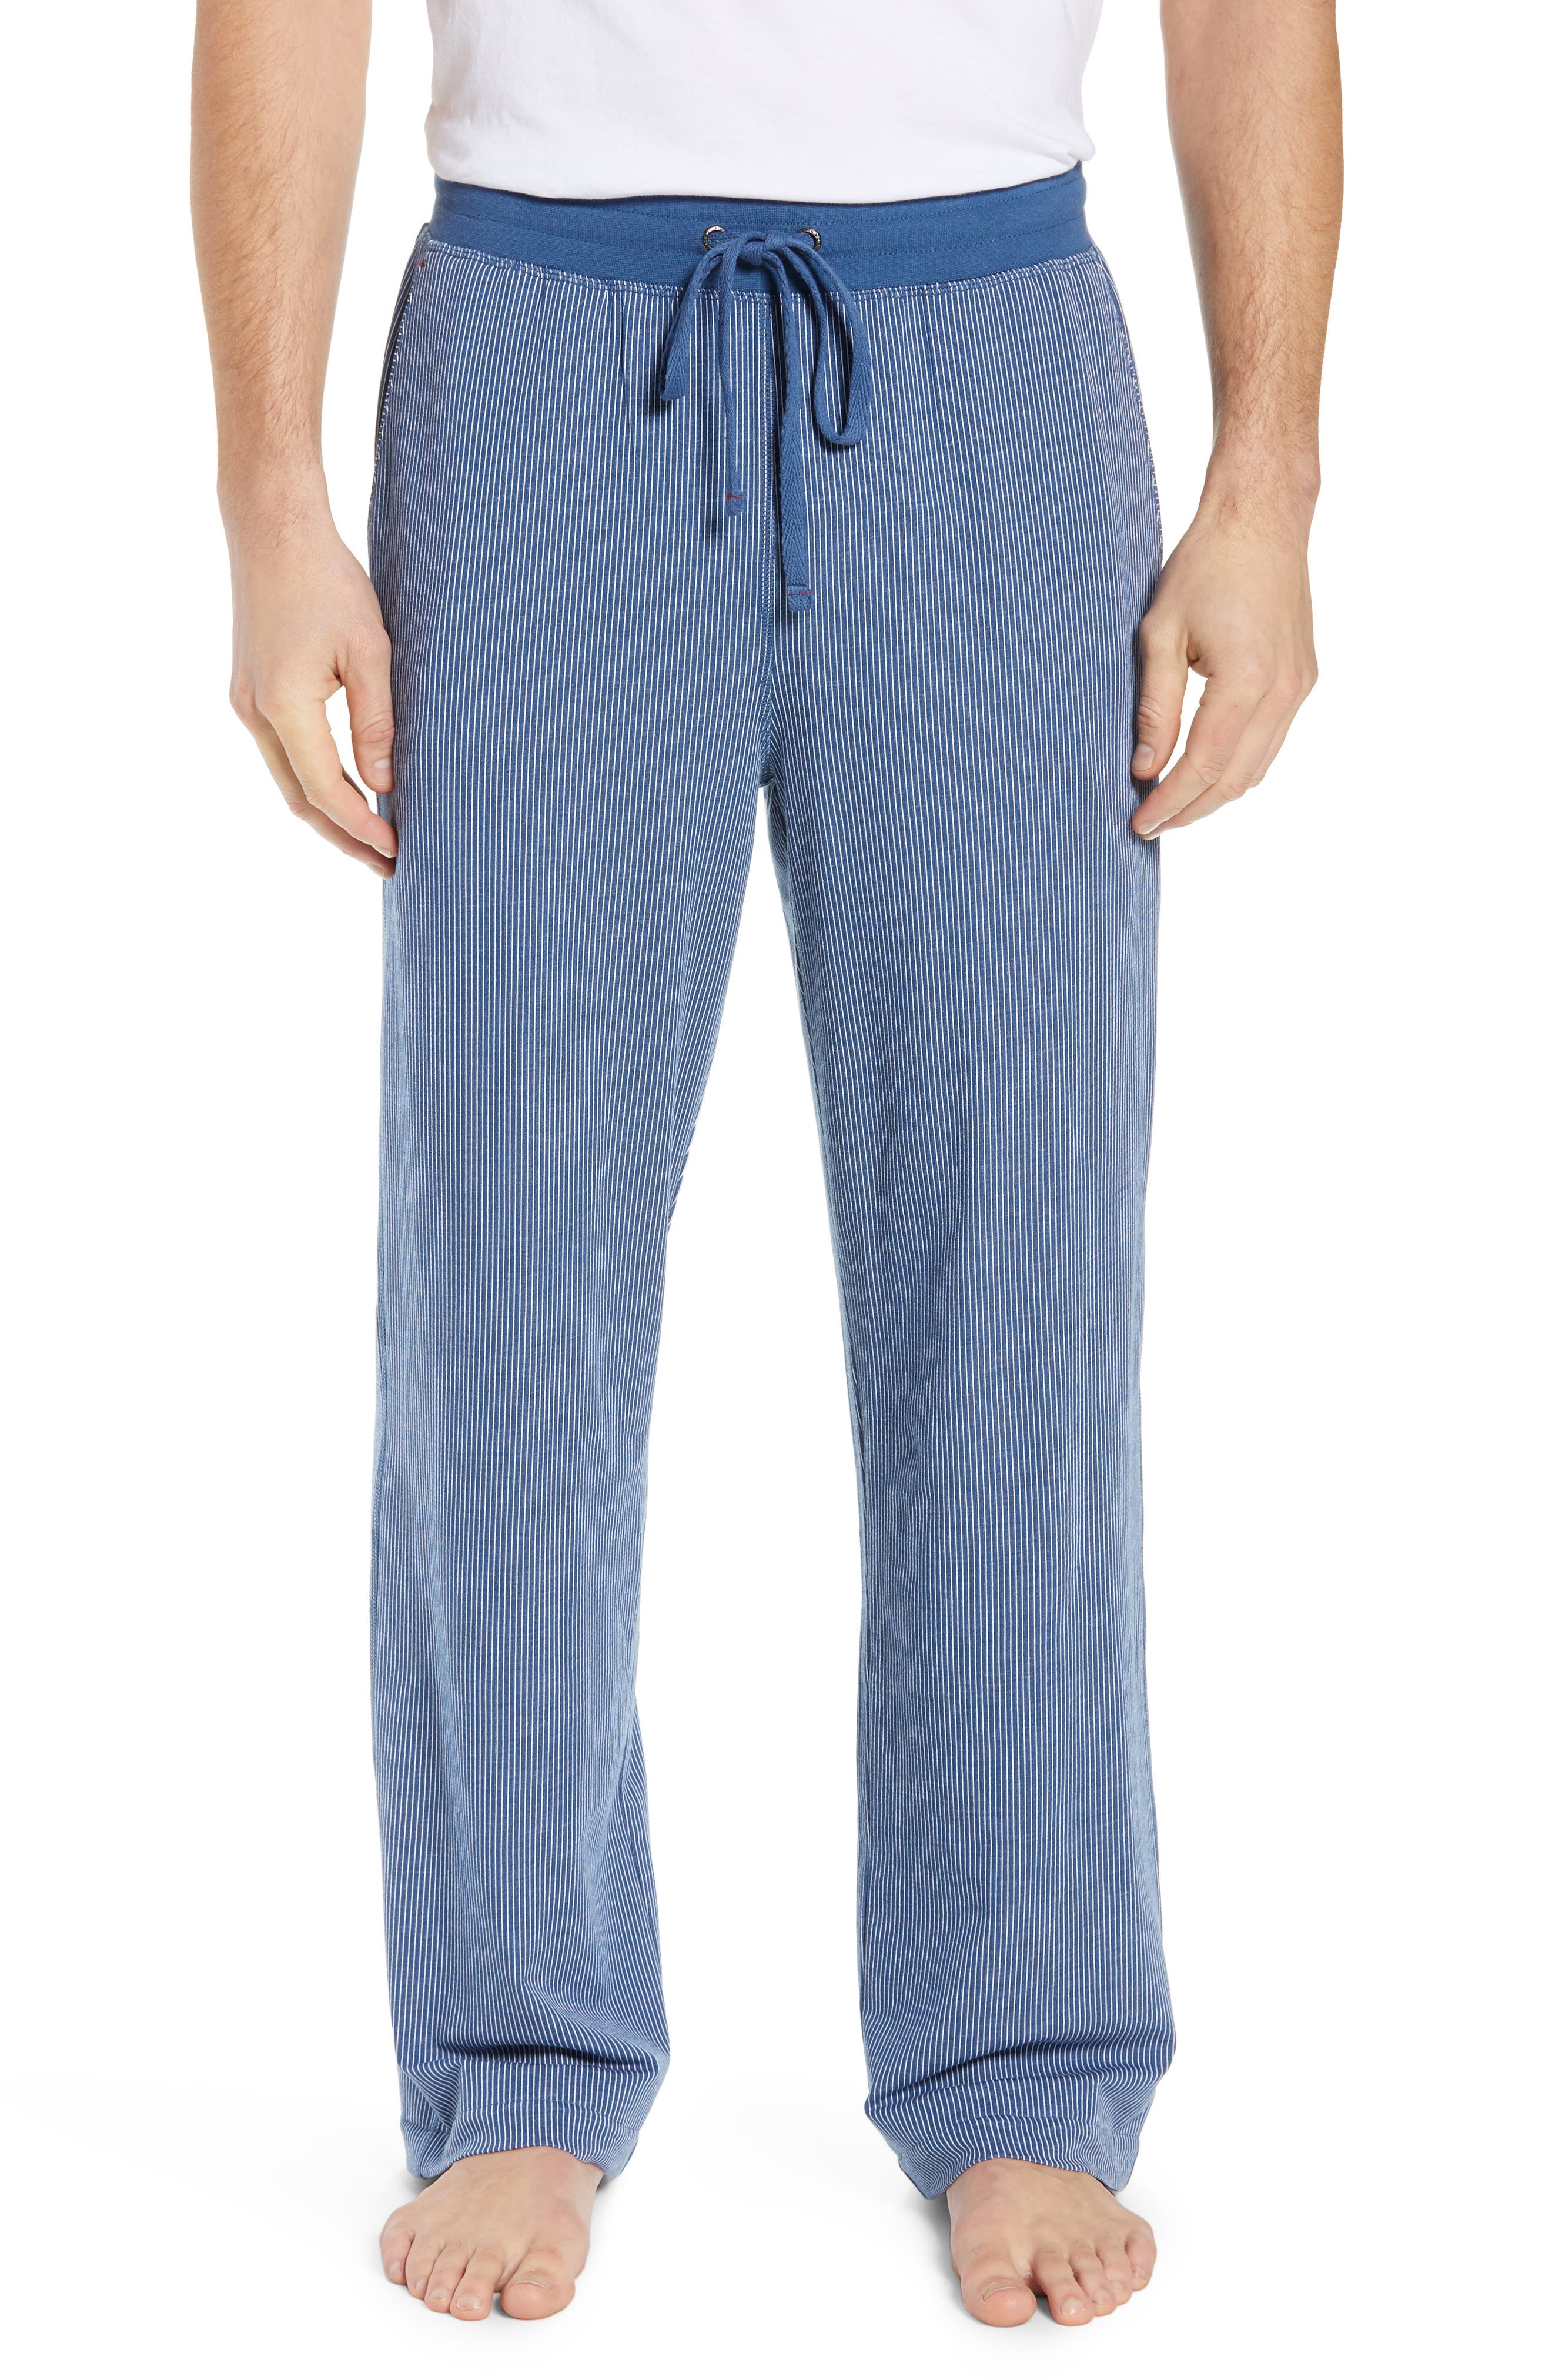 Daniel Buchler Stretch Cotton & Modal Pajama Pants, Blue